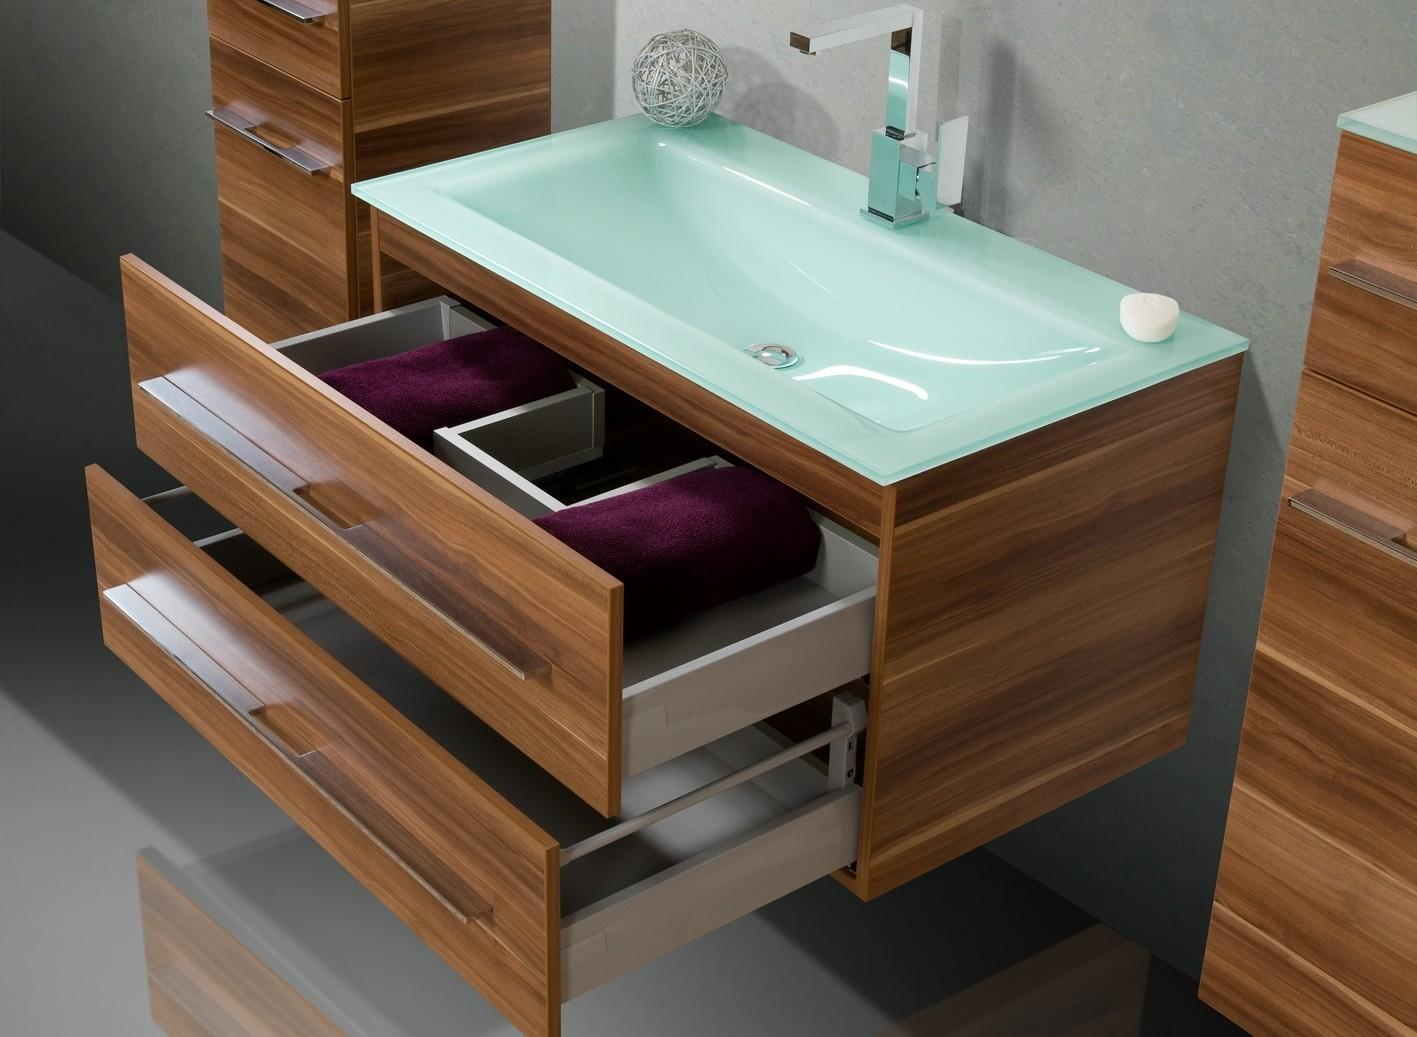 badm bel set mit glaswaschbecken 90 cm 384. Black Bedroom Furniture Sets. Home Design Ideas